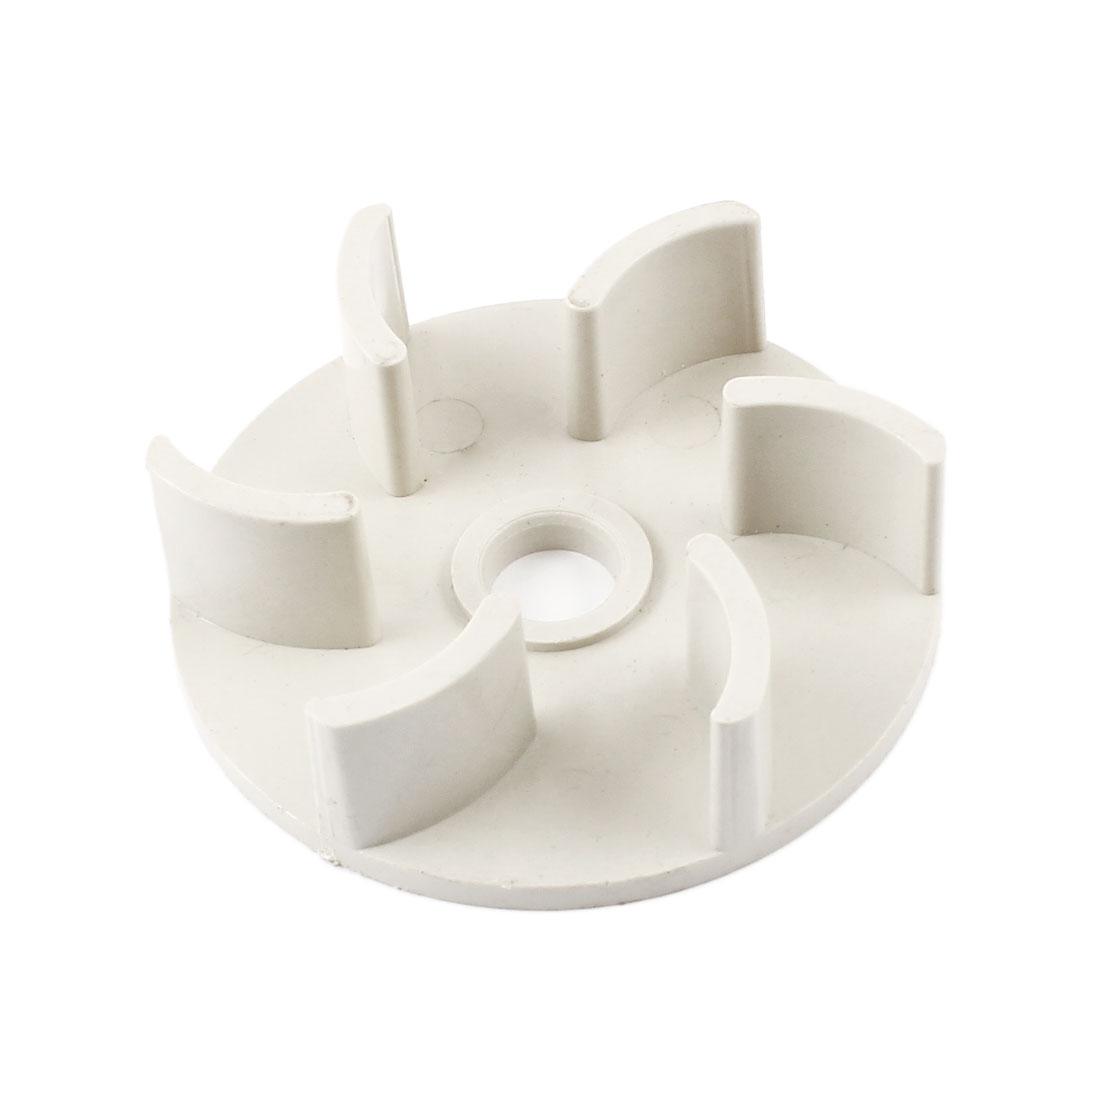 Beige Hard Plastic 61mm Outside Dia 10mm Inner Diameter 6 Fan Vanes Electric Water Fuel Pump Rotor Impeller